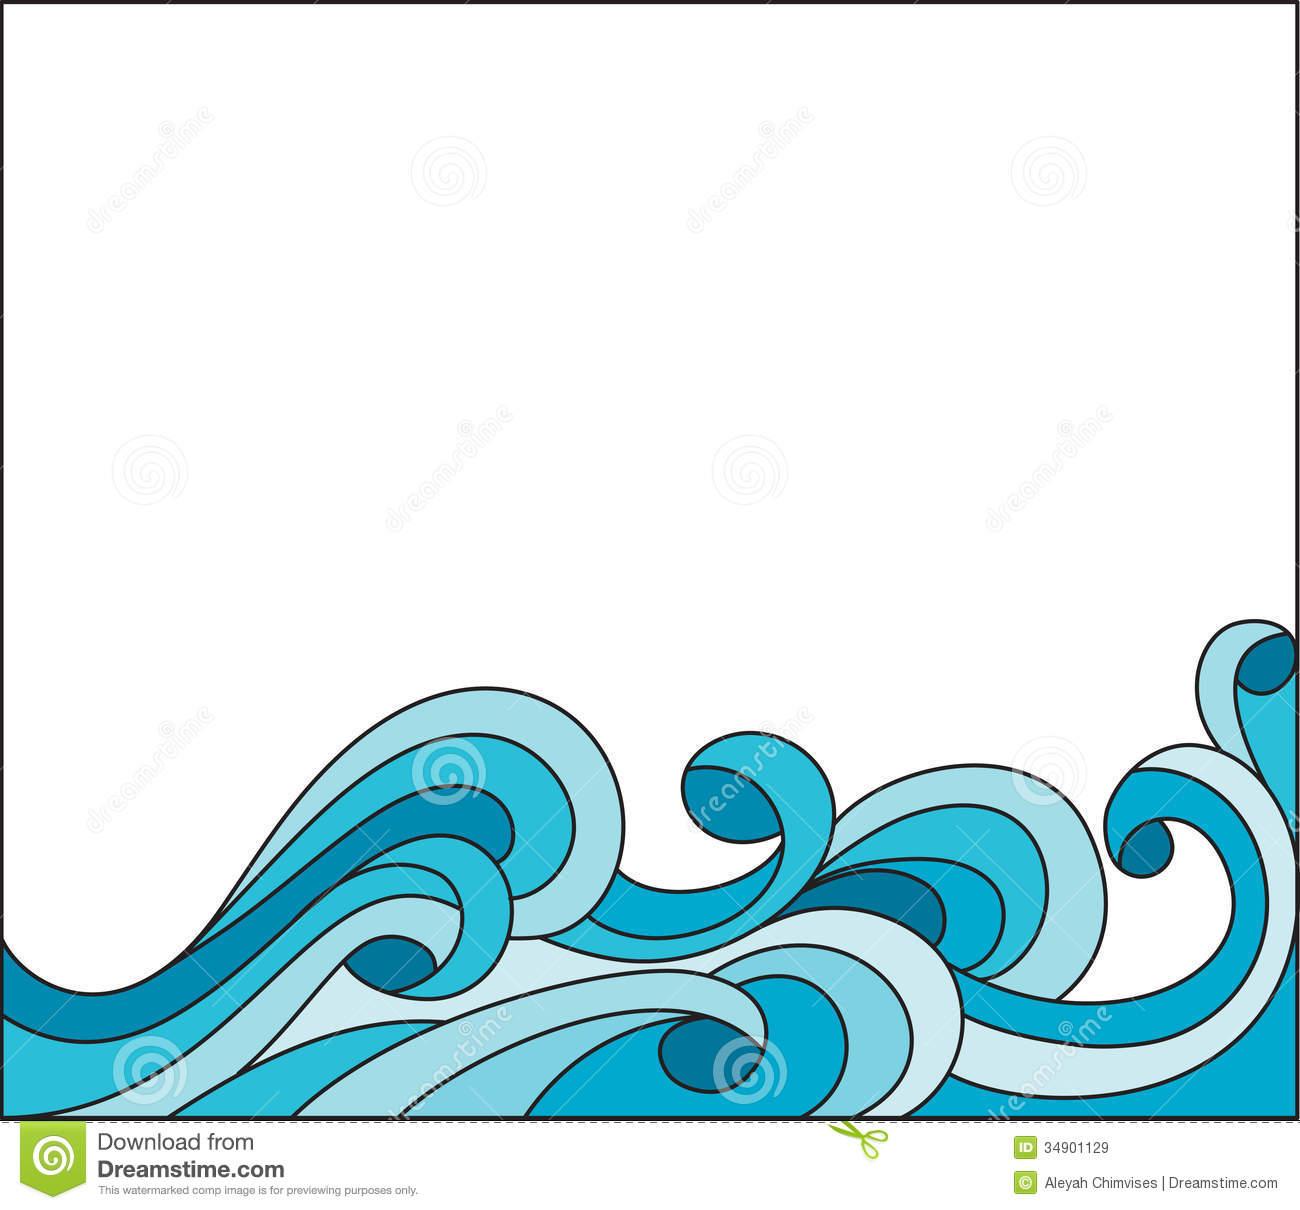 Ocean border free download. Raindrop clipart water frame